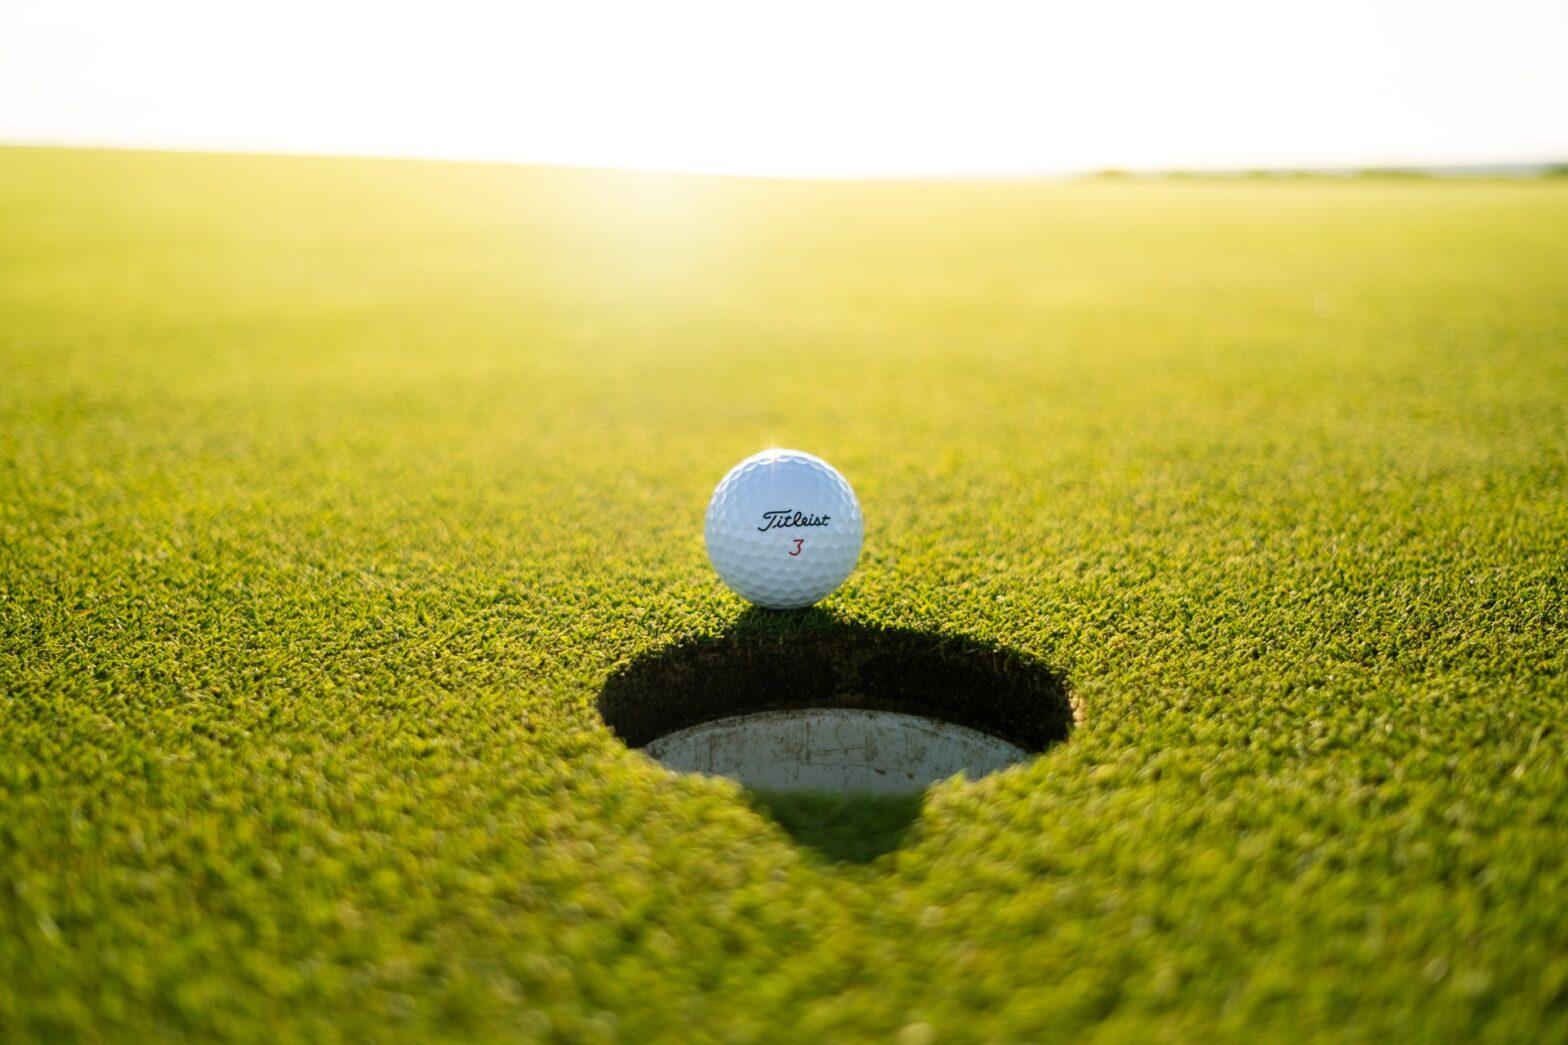 golfur gave